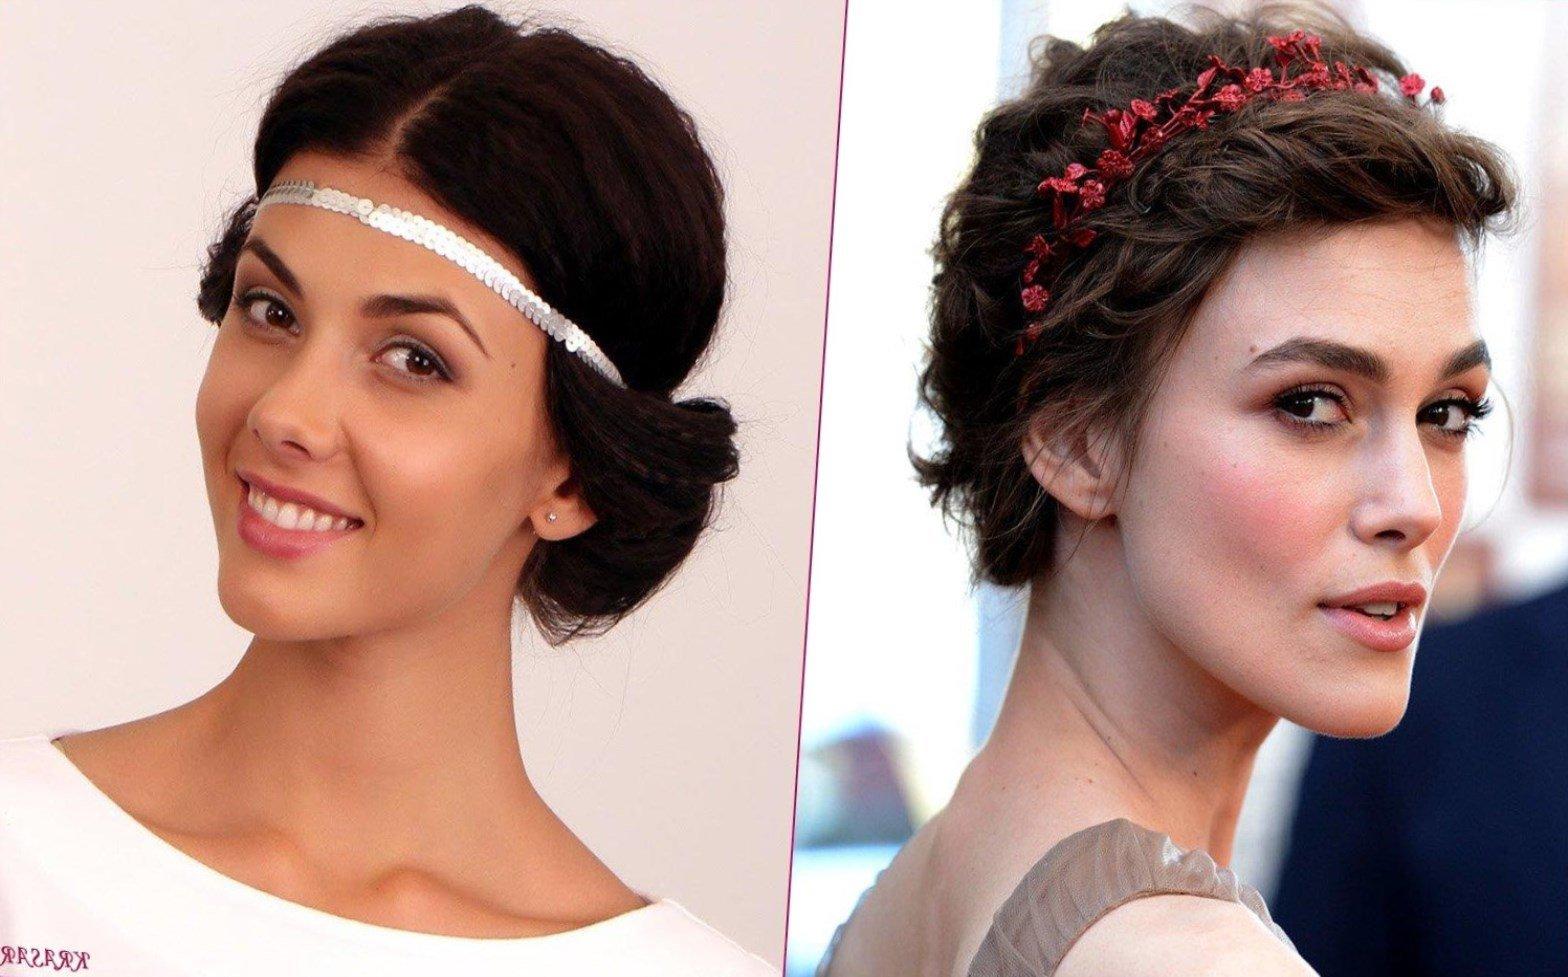 Прически с повязками для волос фото